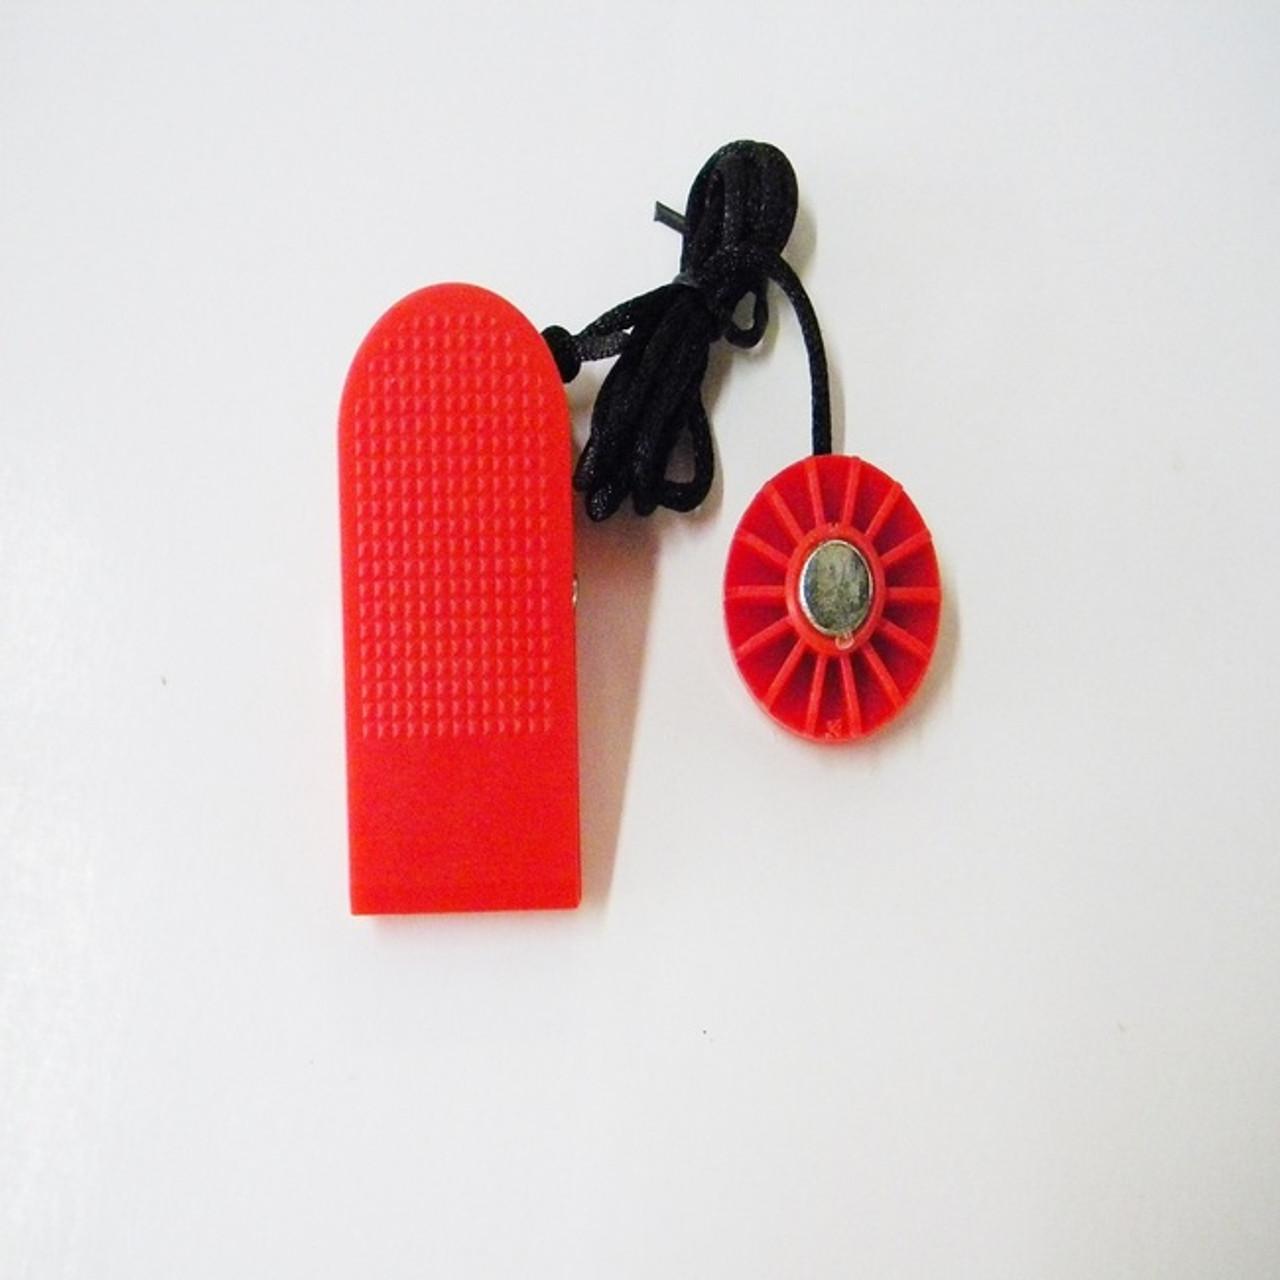 BowFlex Treadclimber Key Part Number 004-7388 Model TC 10 Model TC 20